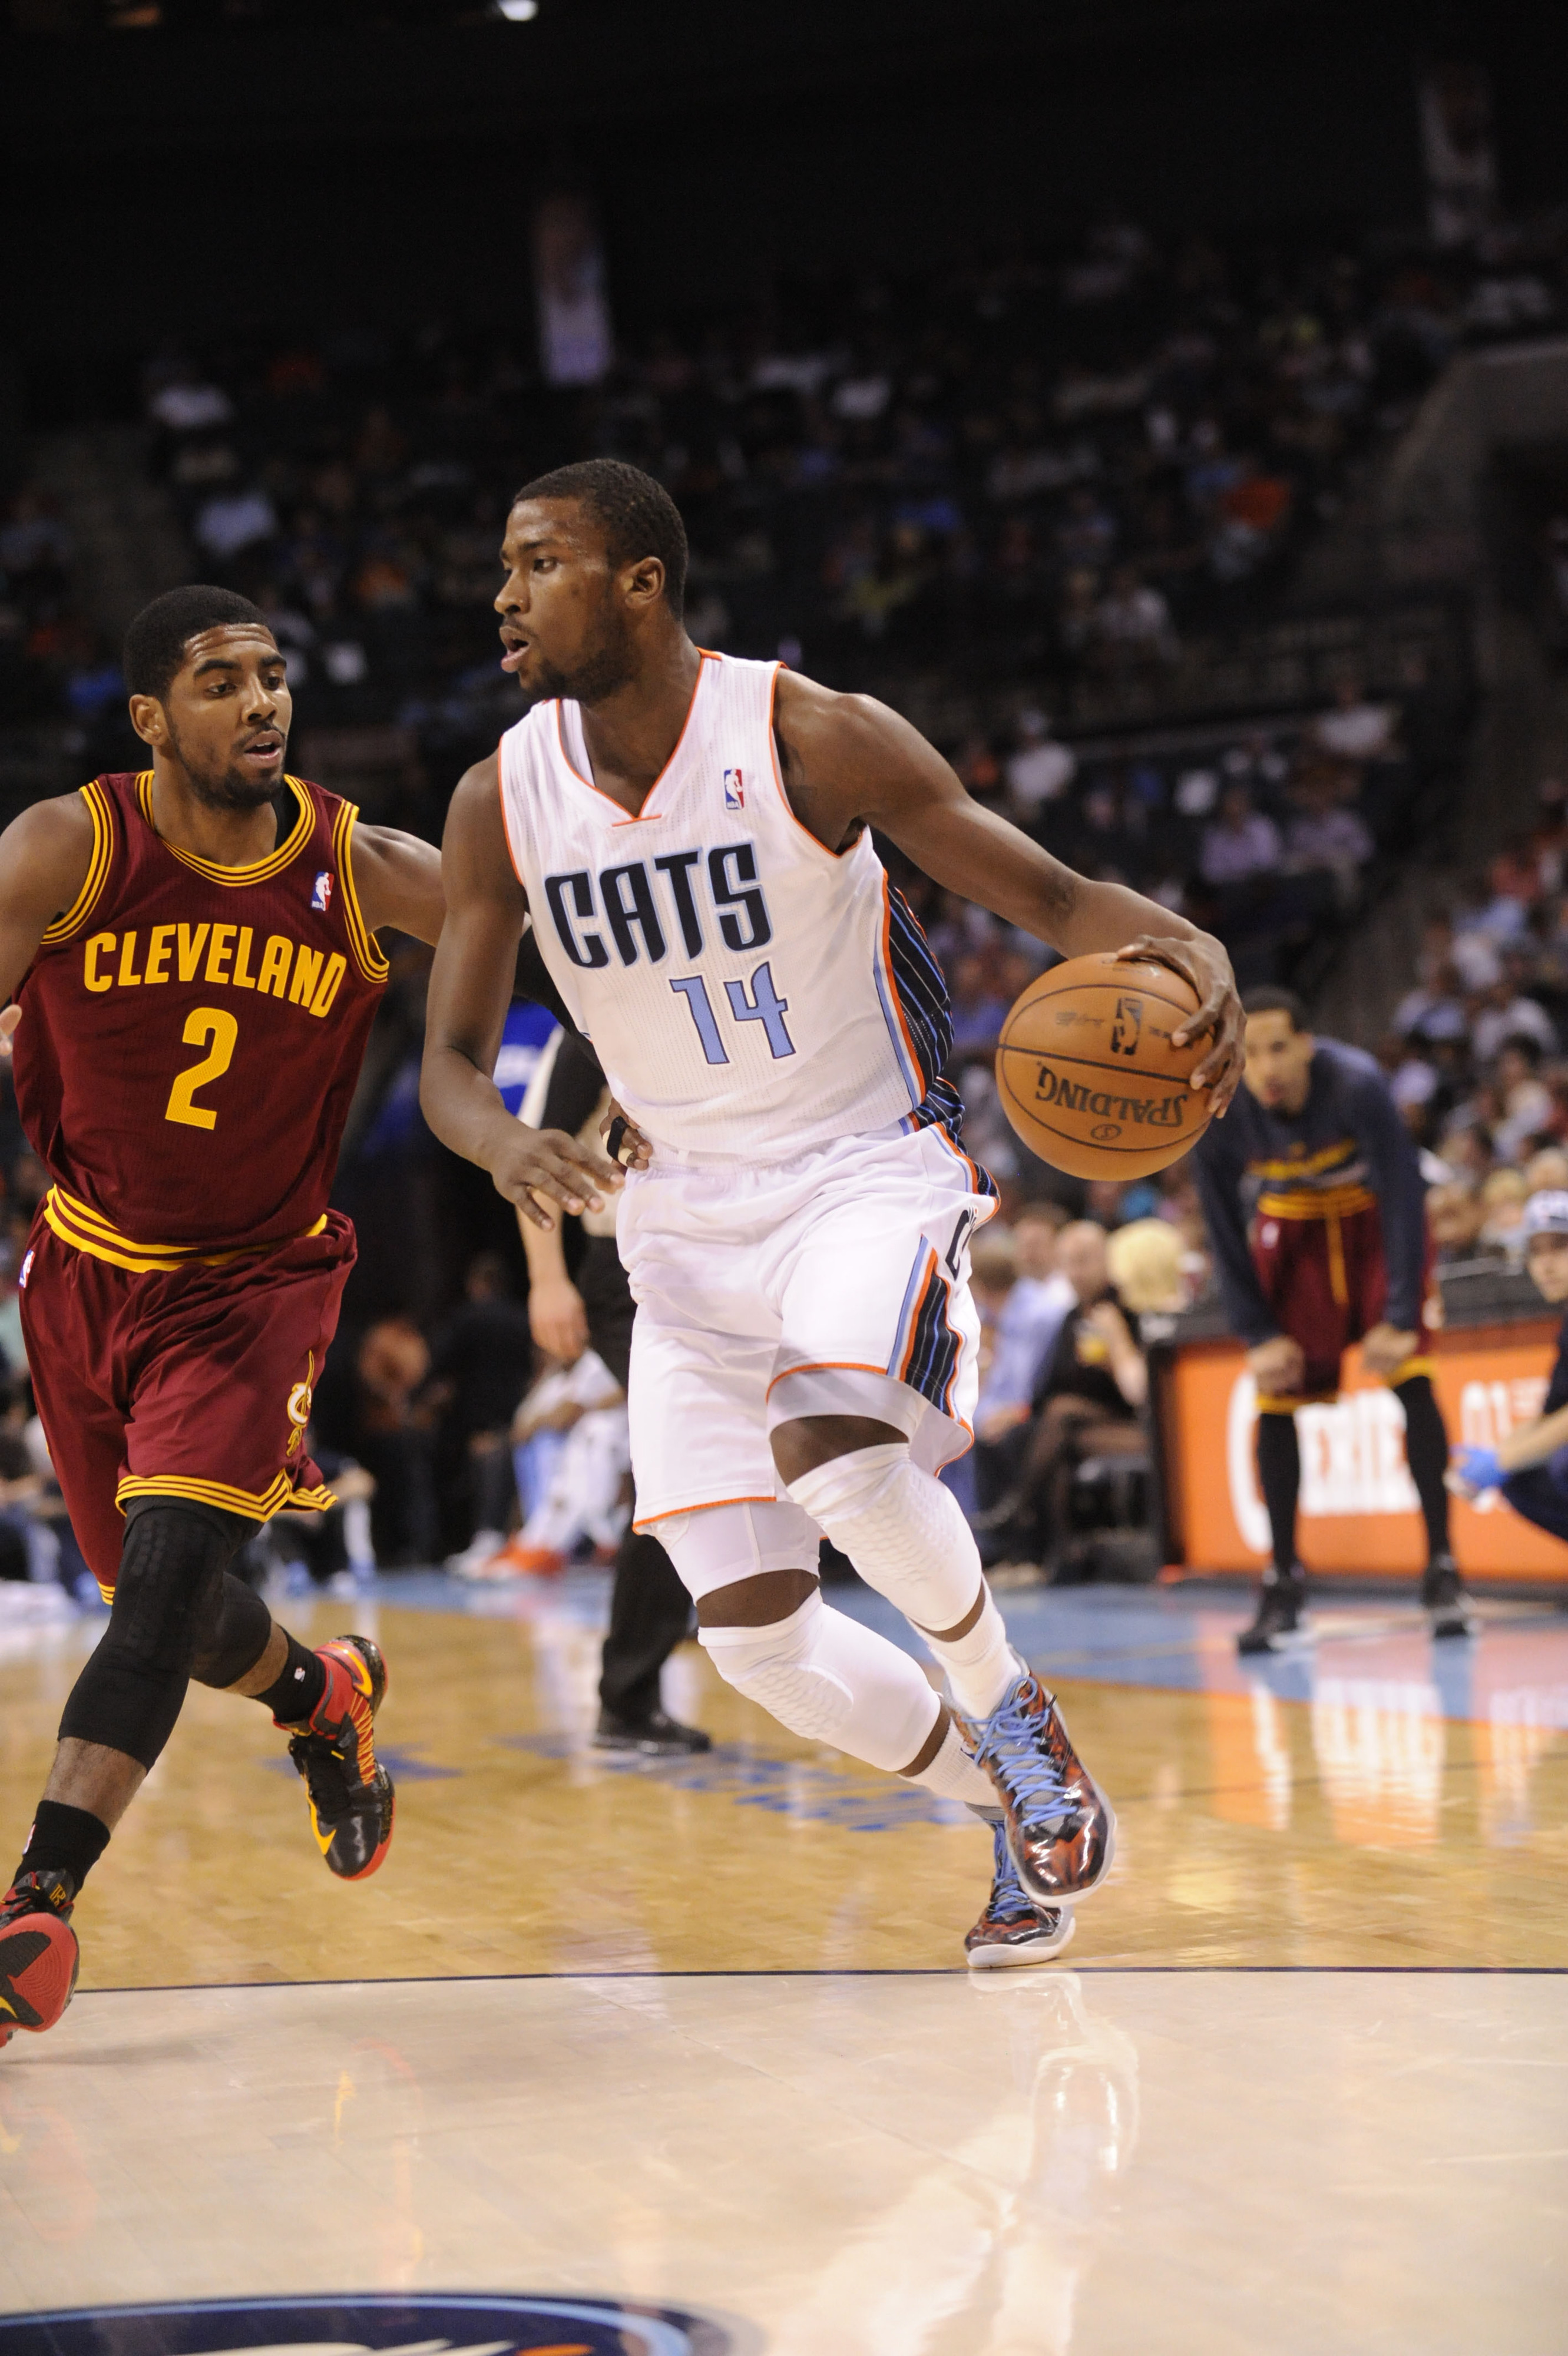 NBA Draft 2013: Charlotte Bobcats seek star player on shallow roster